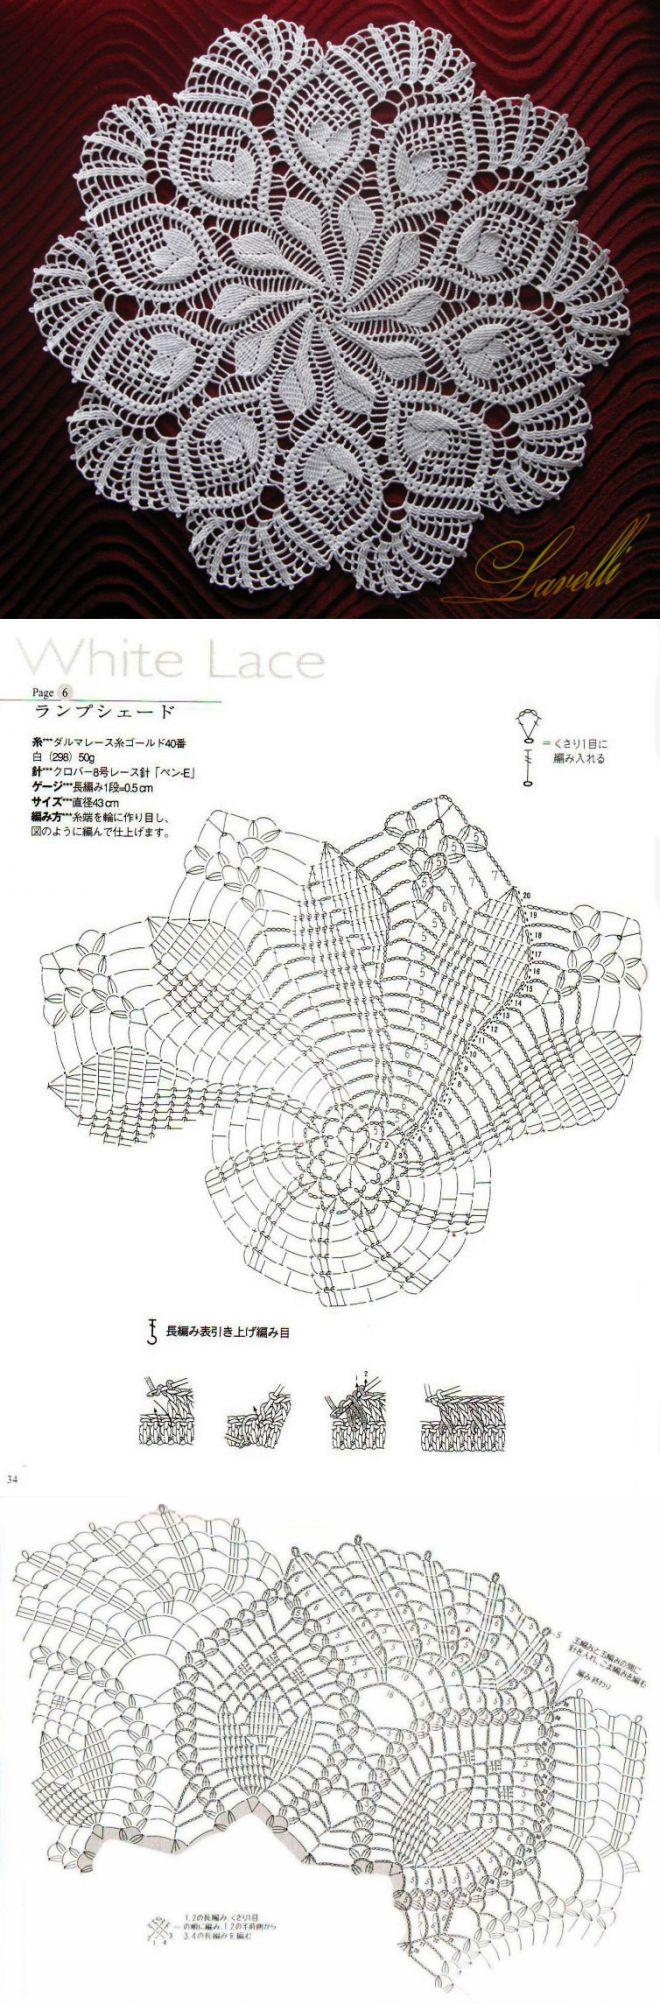 Napkin crochet scheme...<3 Deniz <3